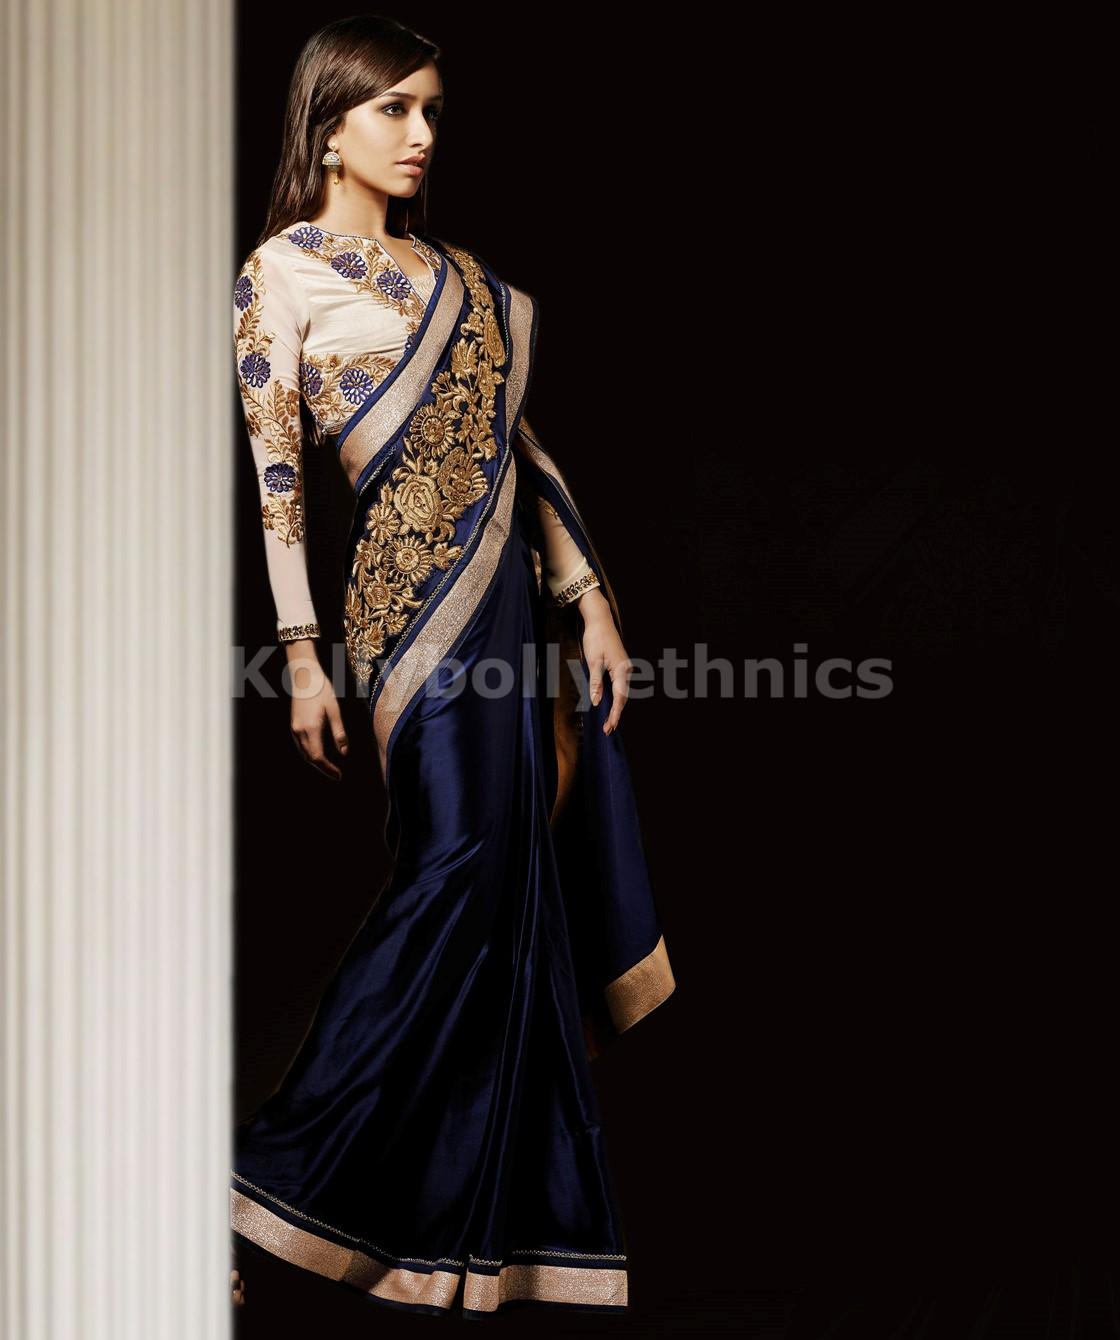 Blue And White Shraddha Kapoor Saree